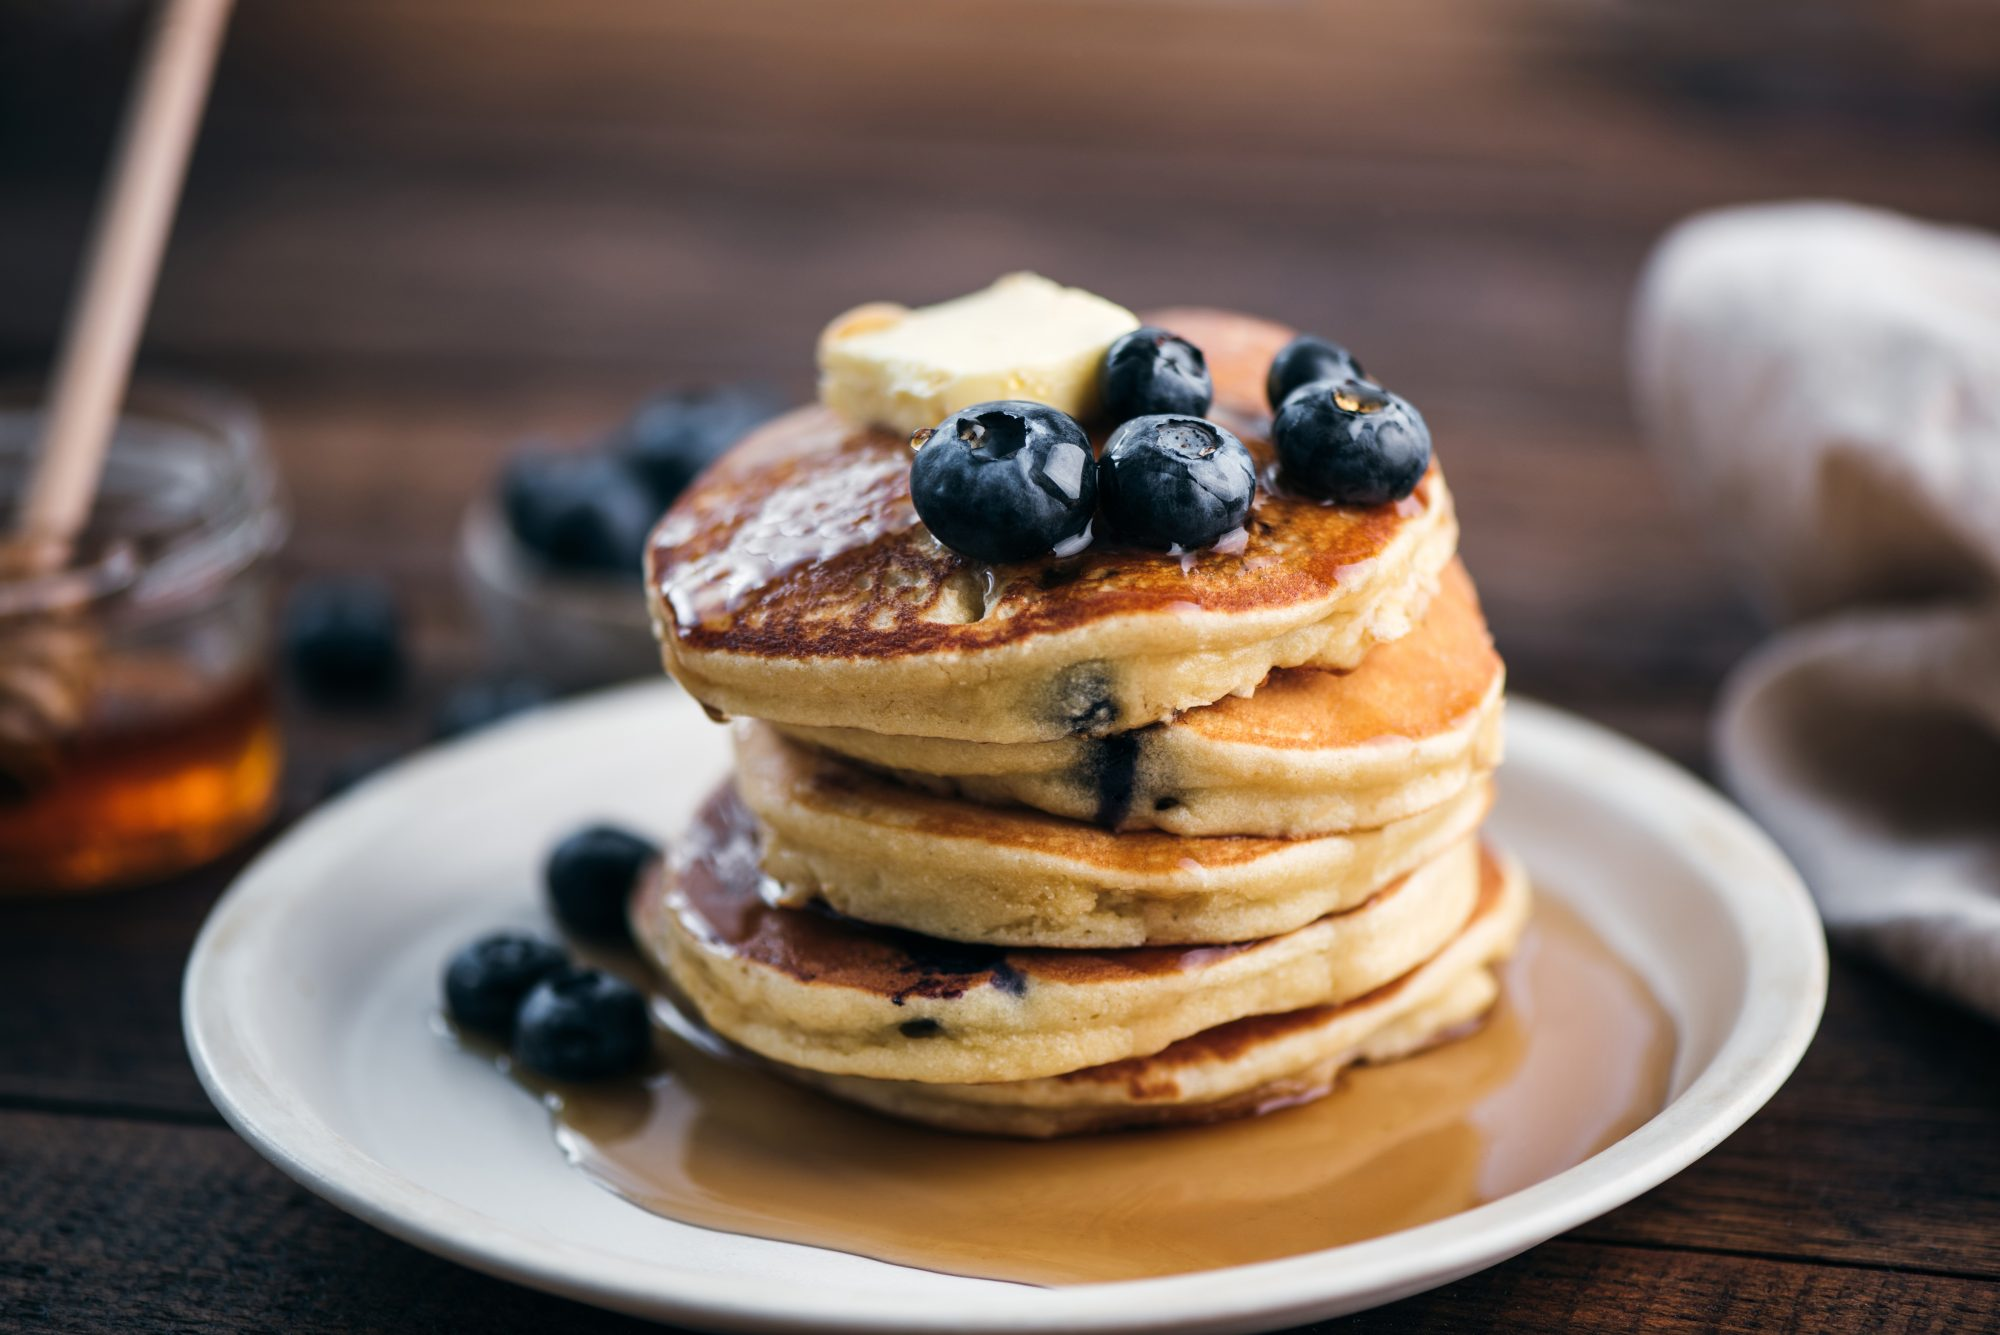 blueberry-pancake-1255787230.jpg